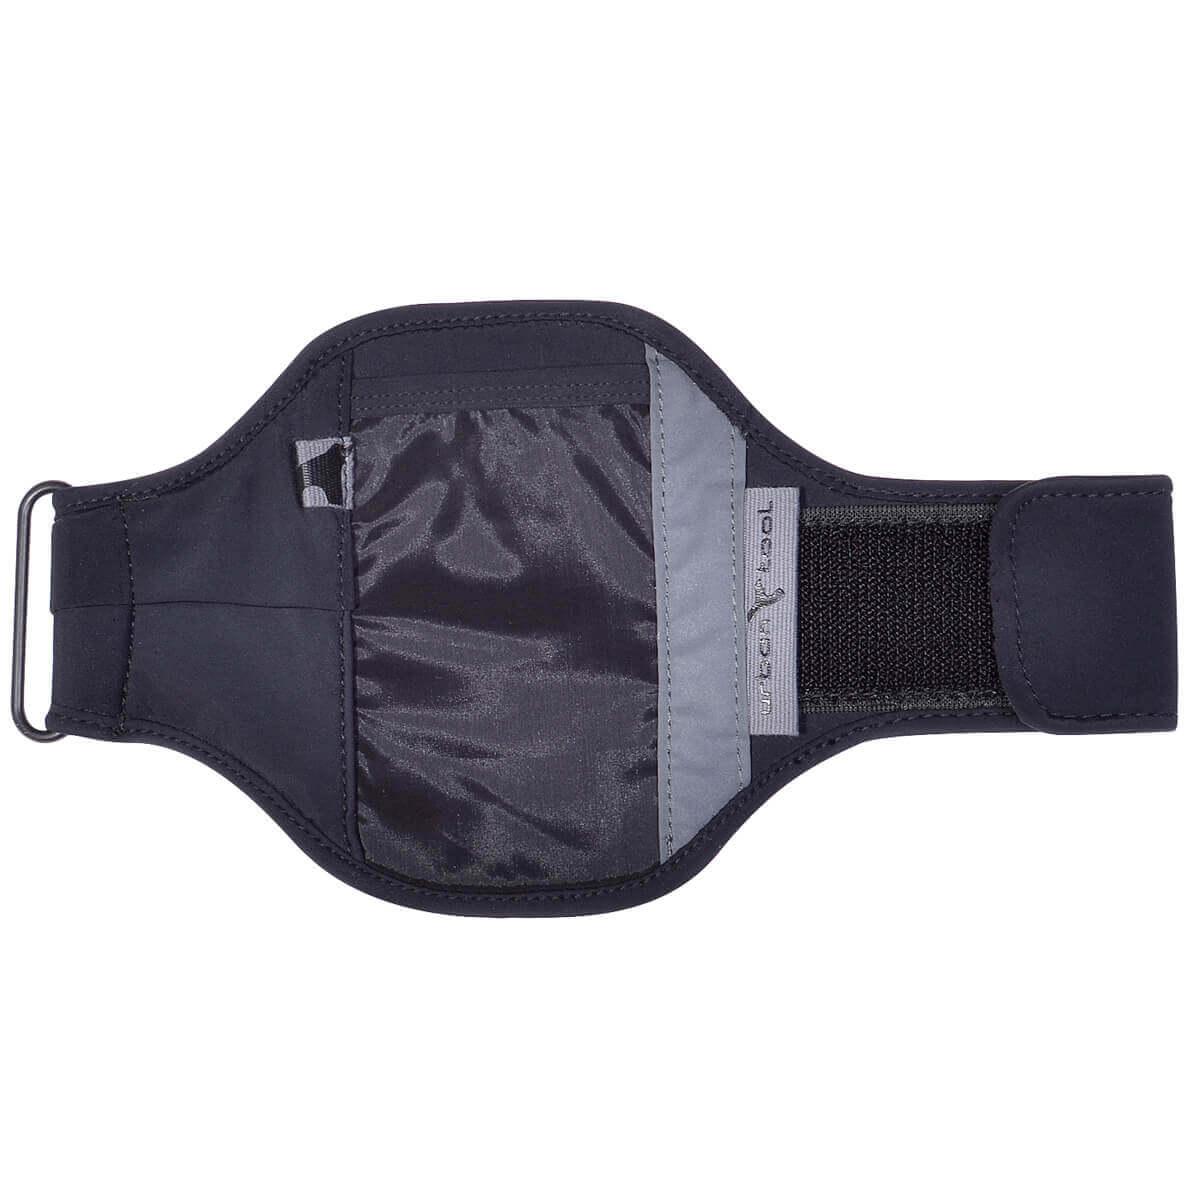 sports armband black